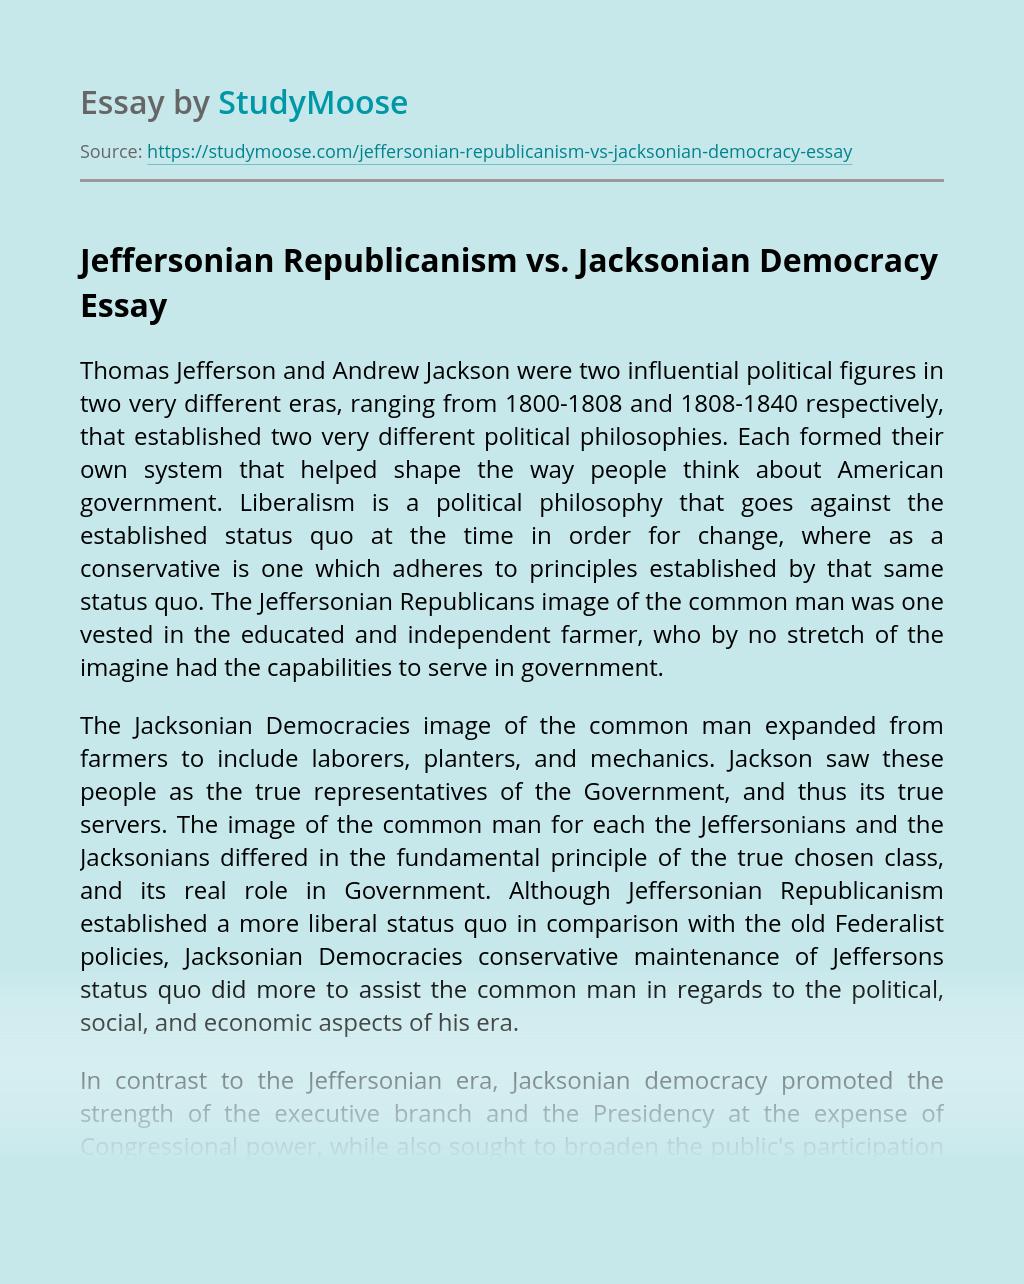 Jeffersonian Republicanism vs. Jacksonian Democracy